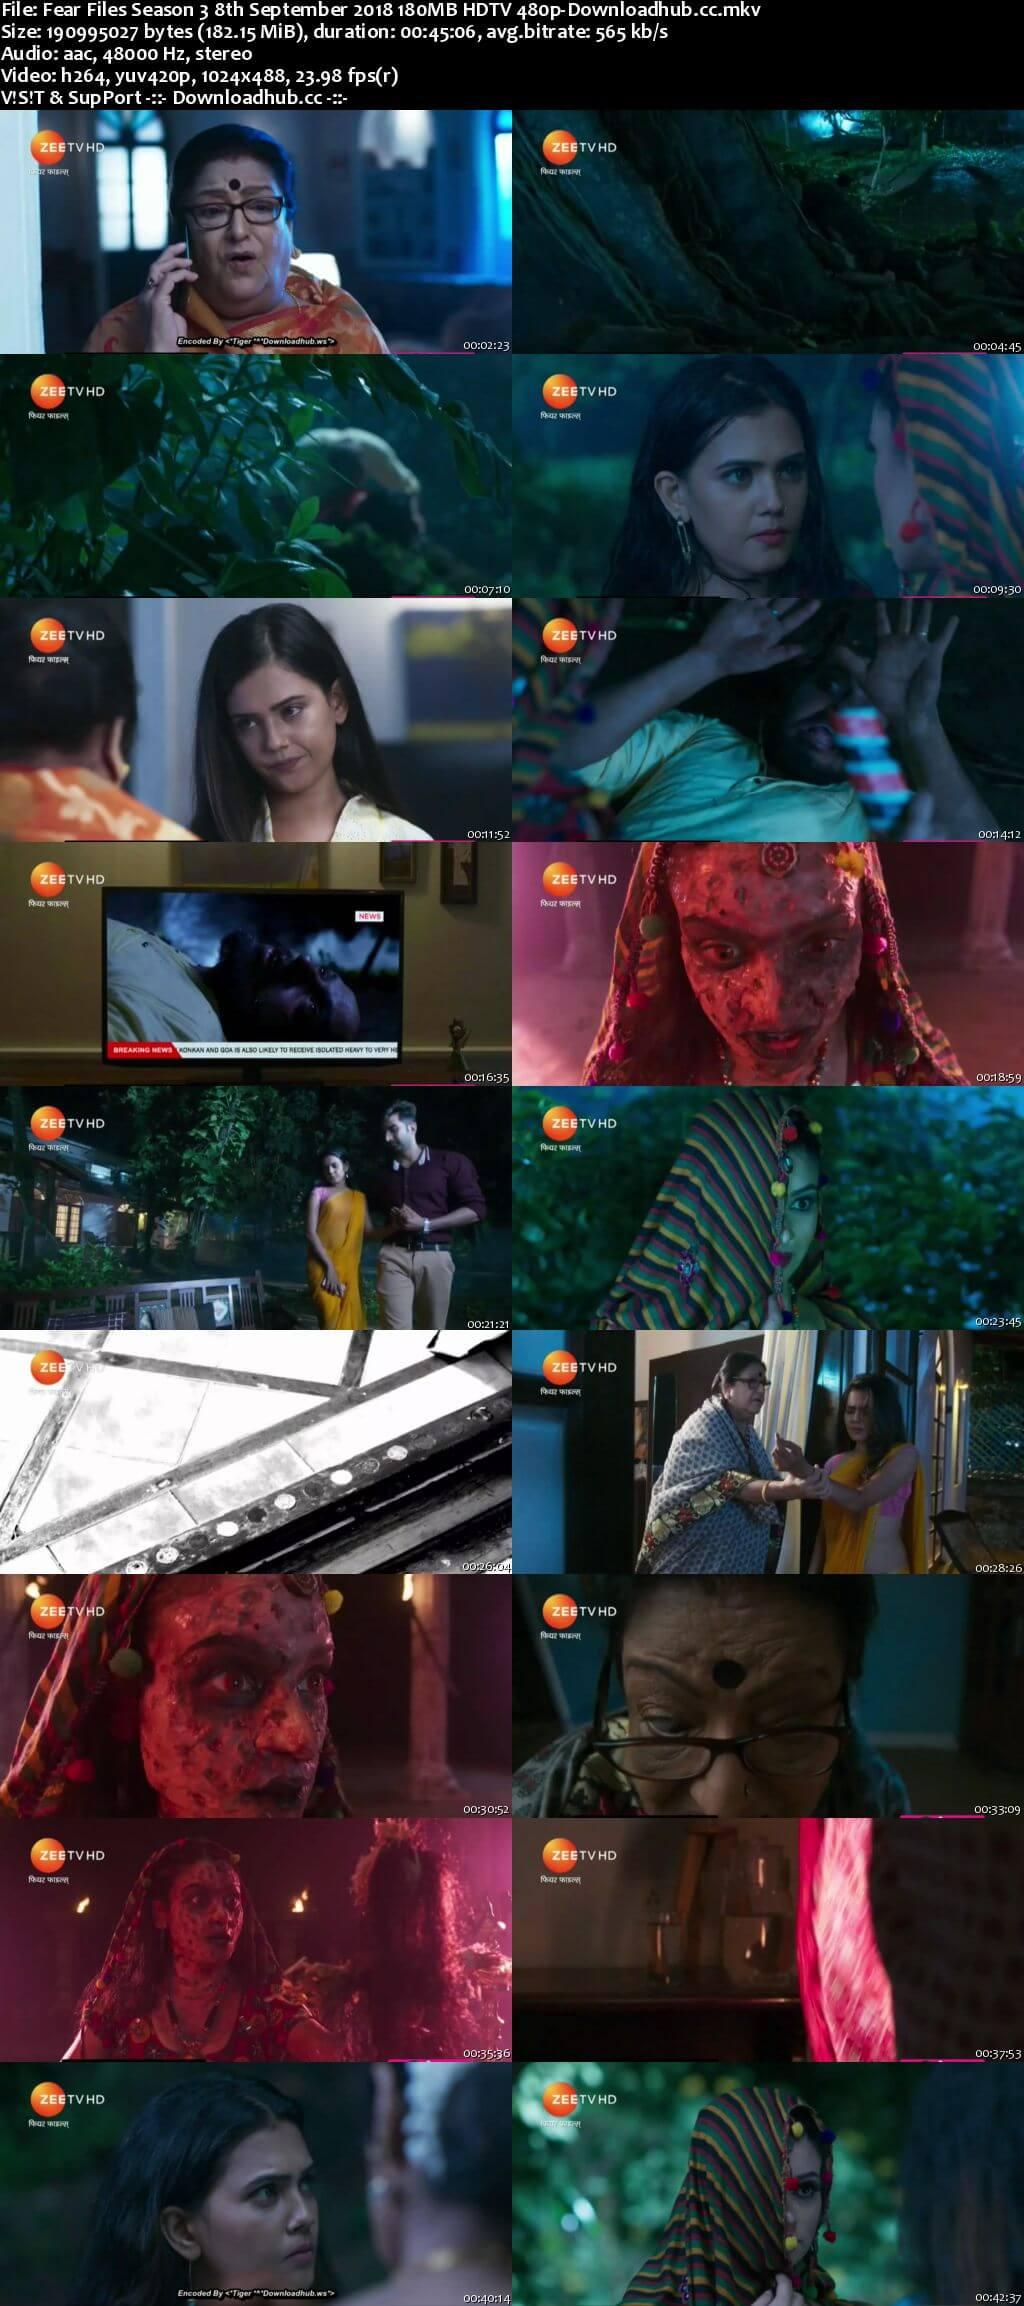 Fear Files Season 3 8th September 2018 180MB HDTV 480p